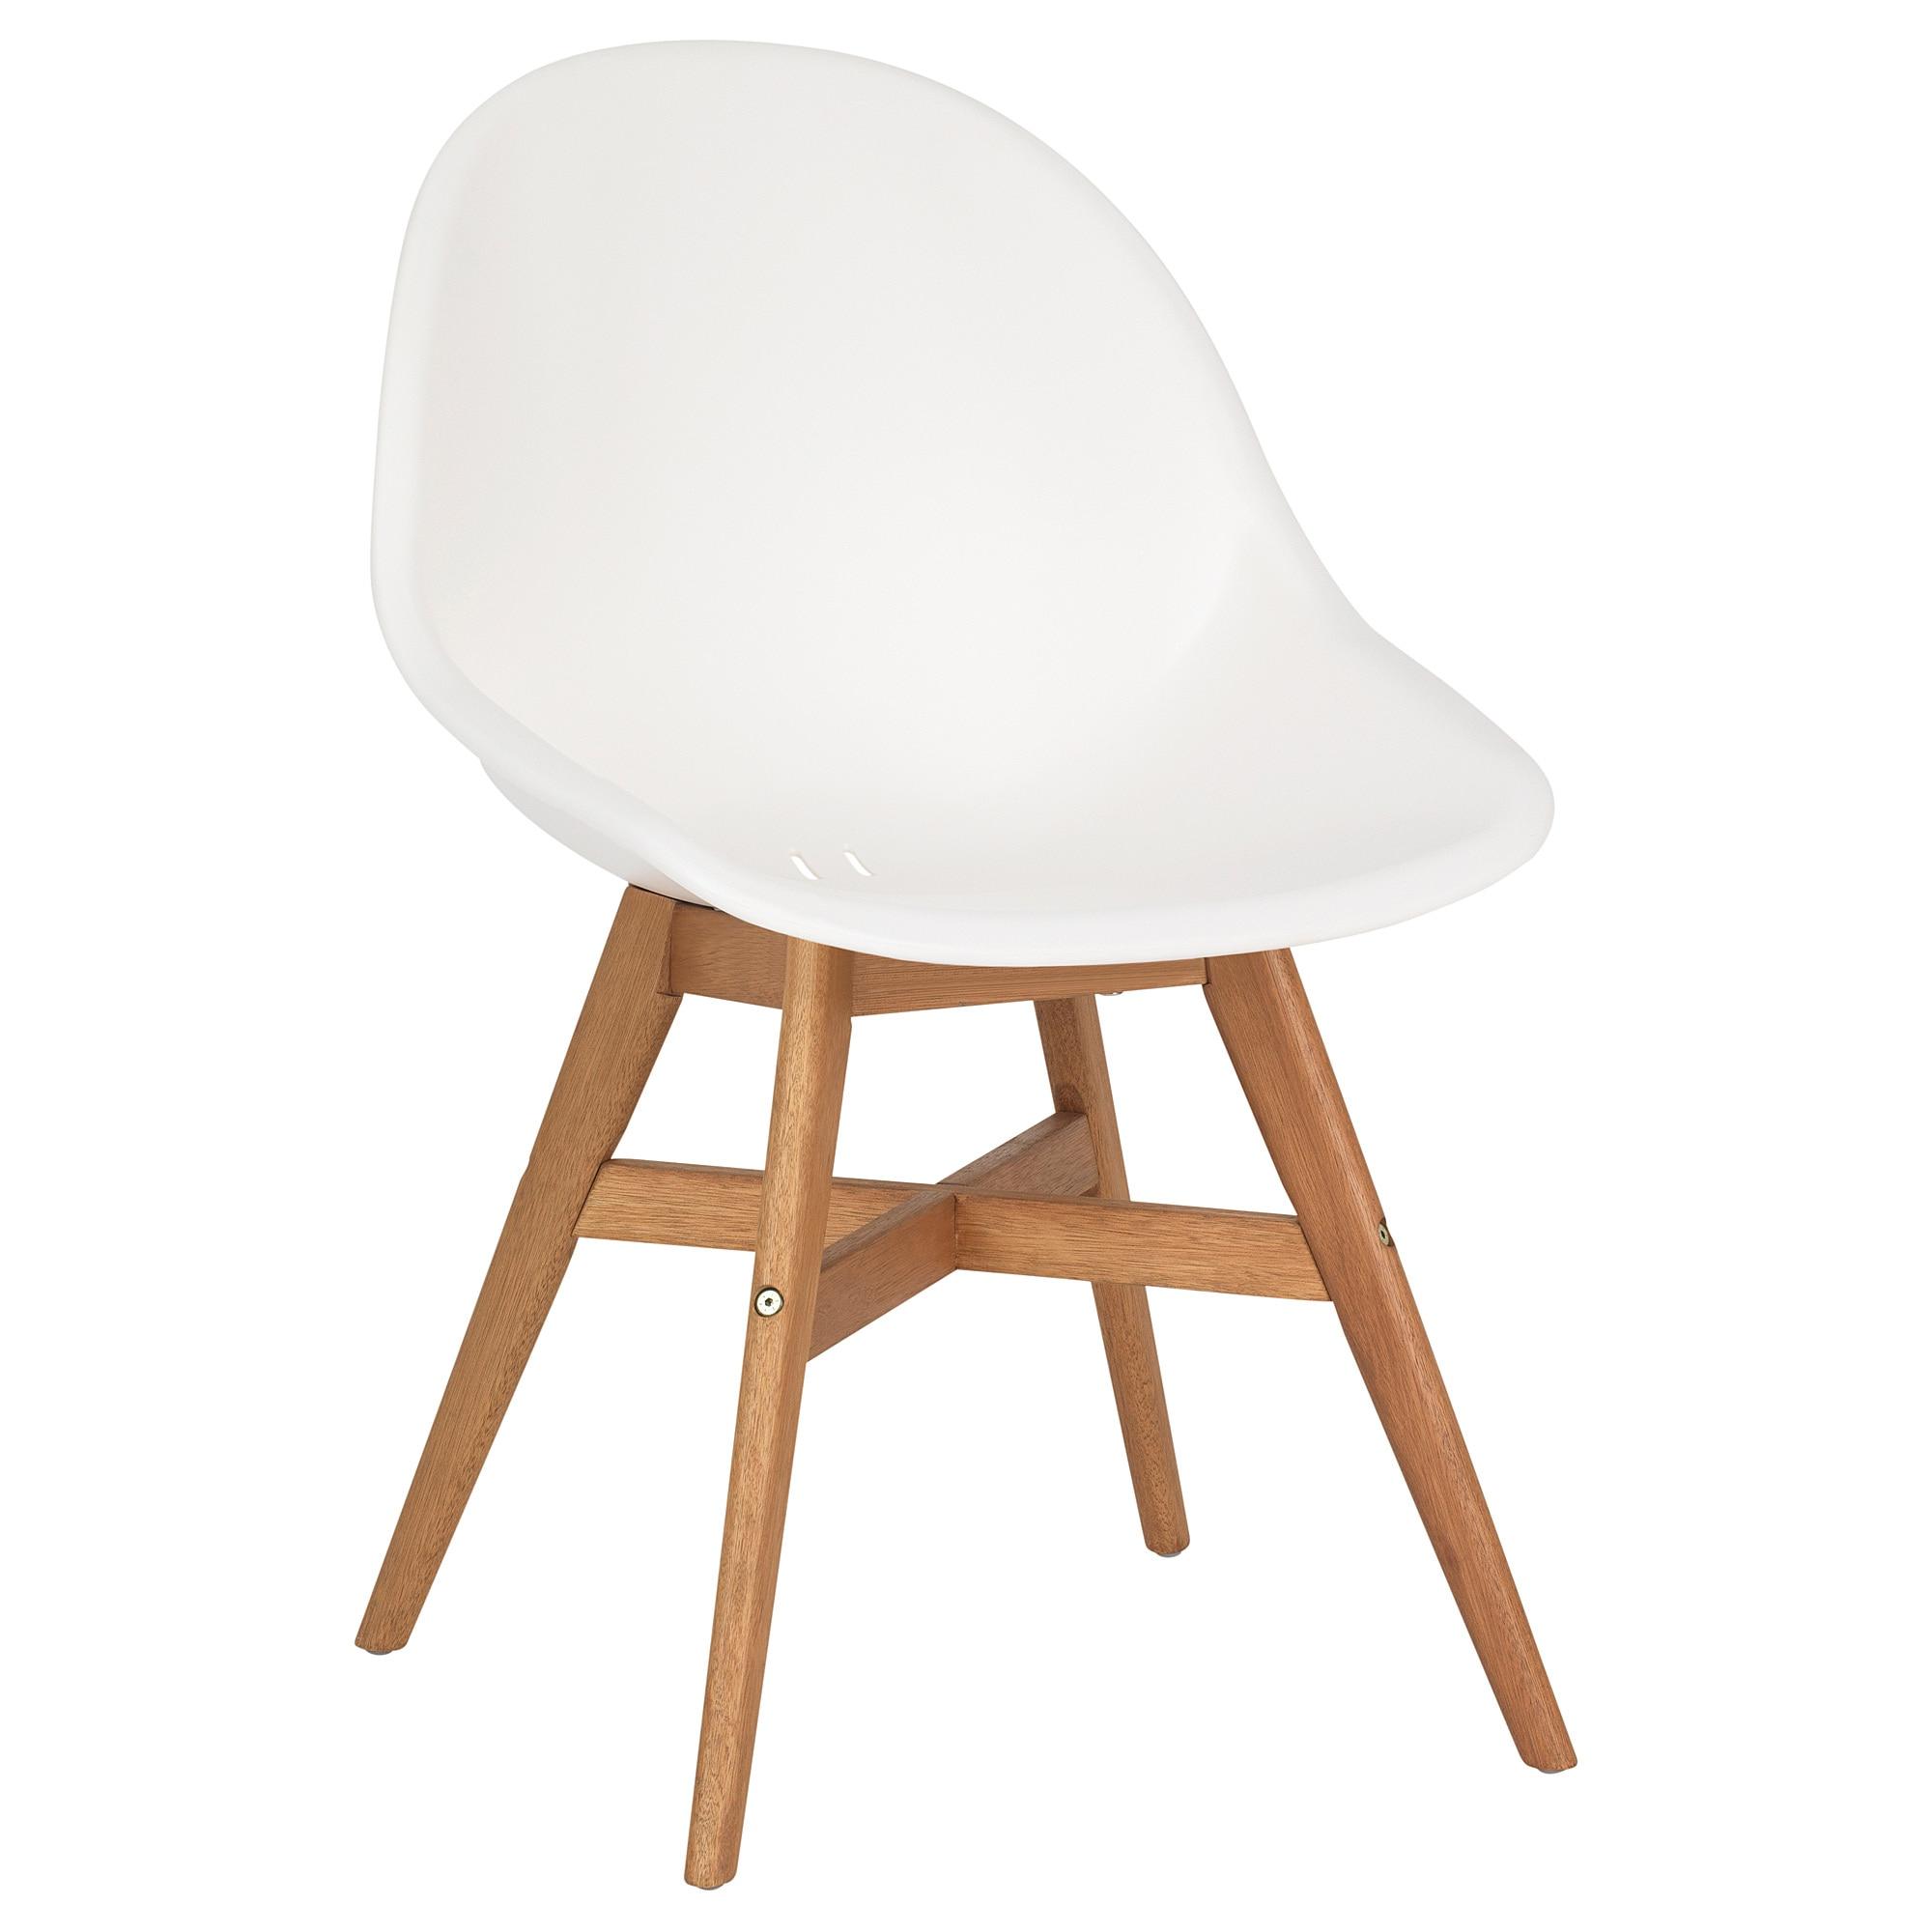 Silla Eames Ikea H9d9 Sillas De Edor Salà N Y Cocina Pra Online Ikea